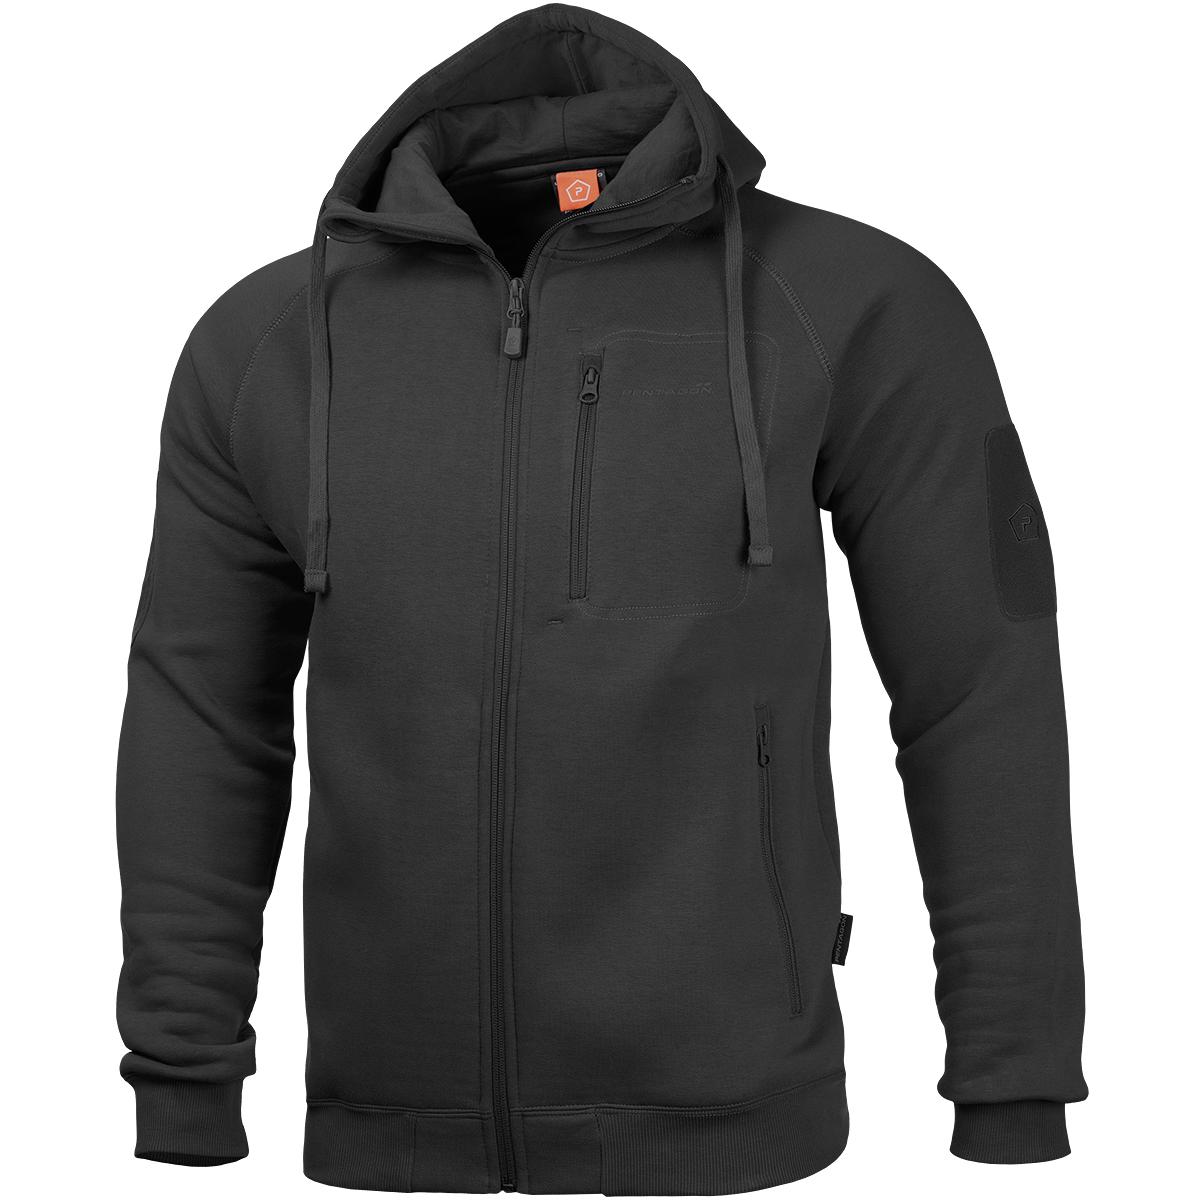 Tactical hoodies